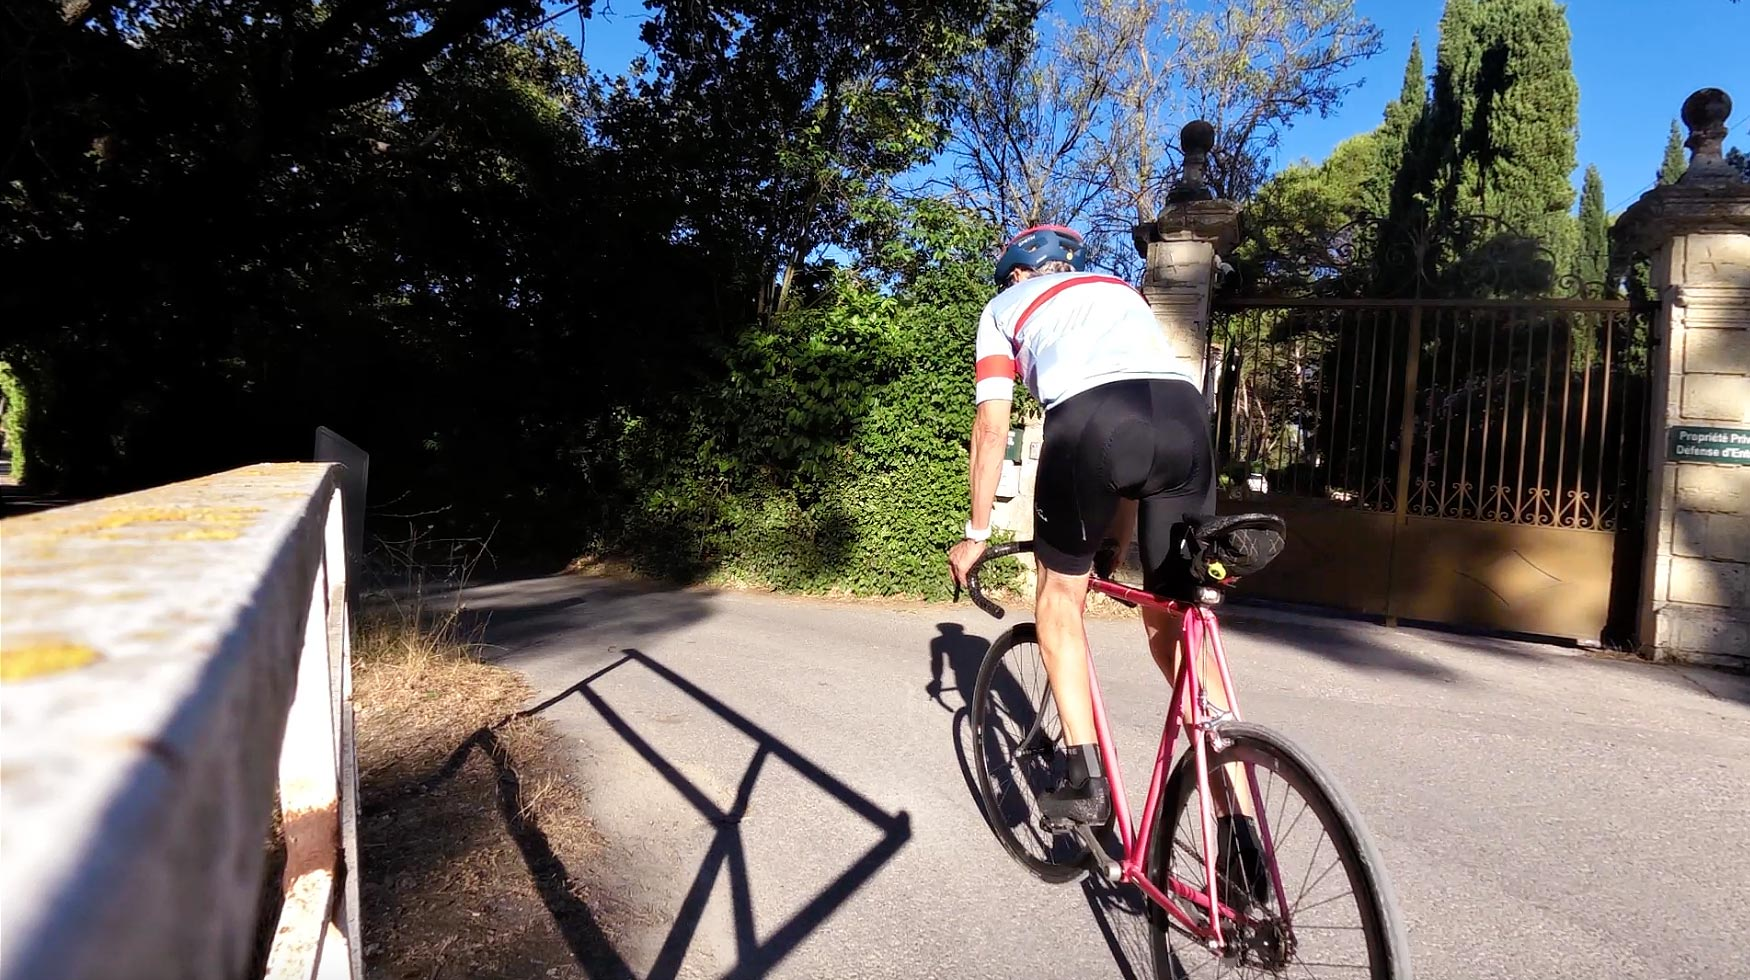 Vélo Bernard Carré Pista tendance Néo Rétro